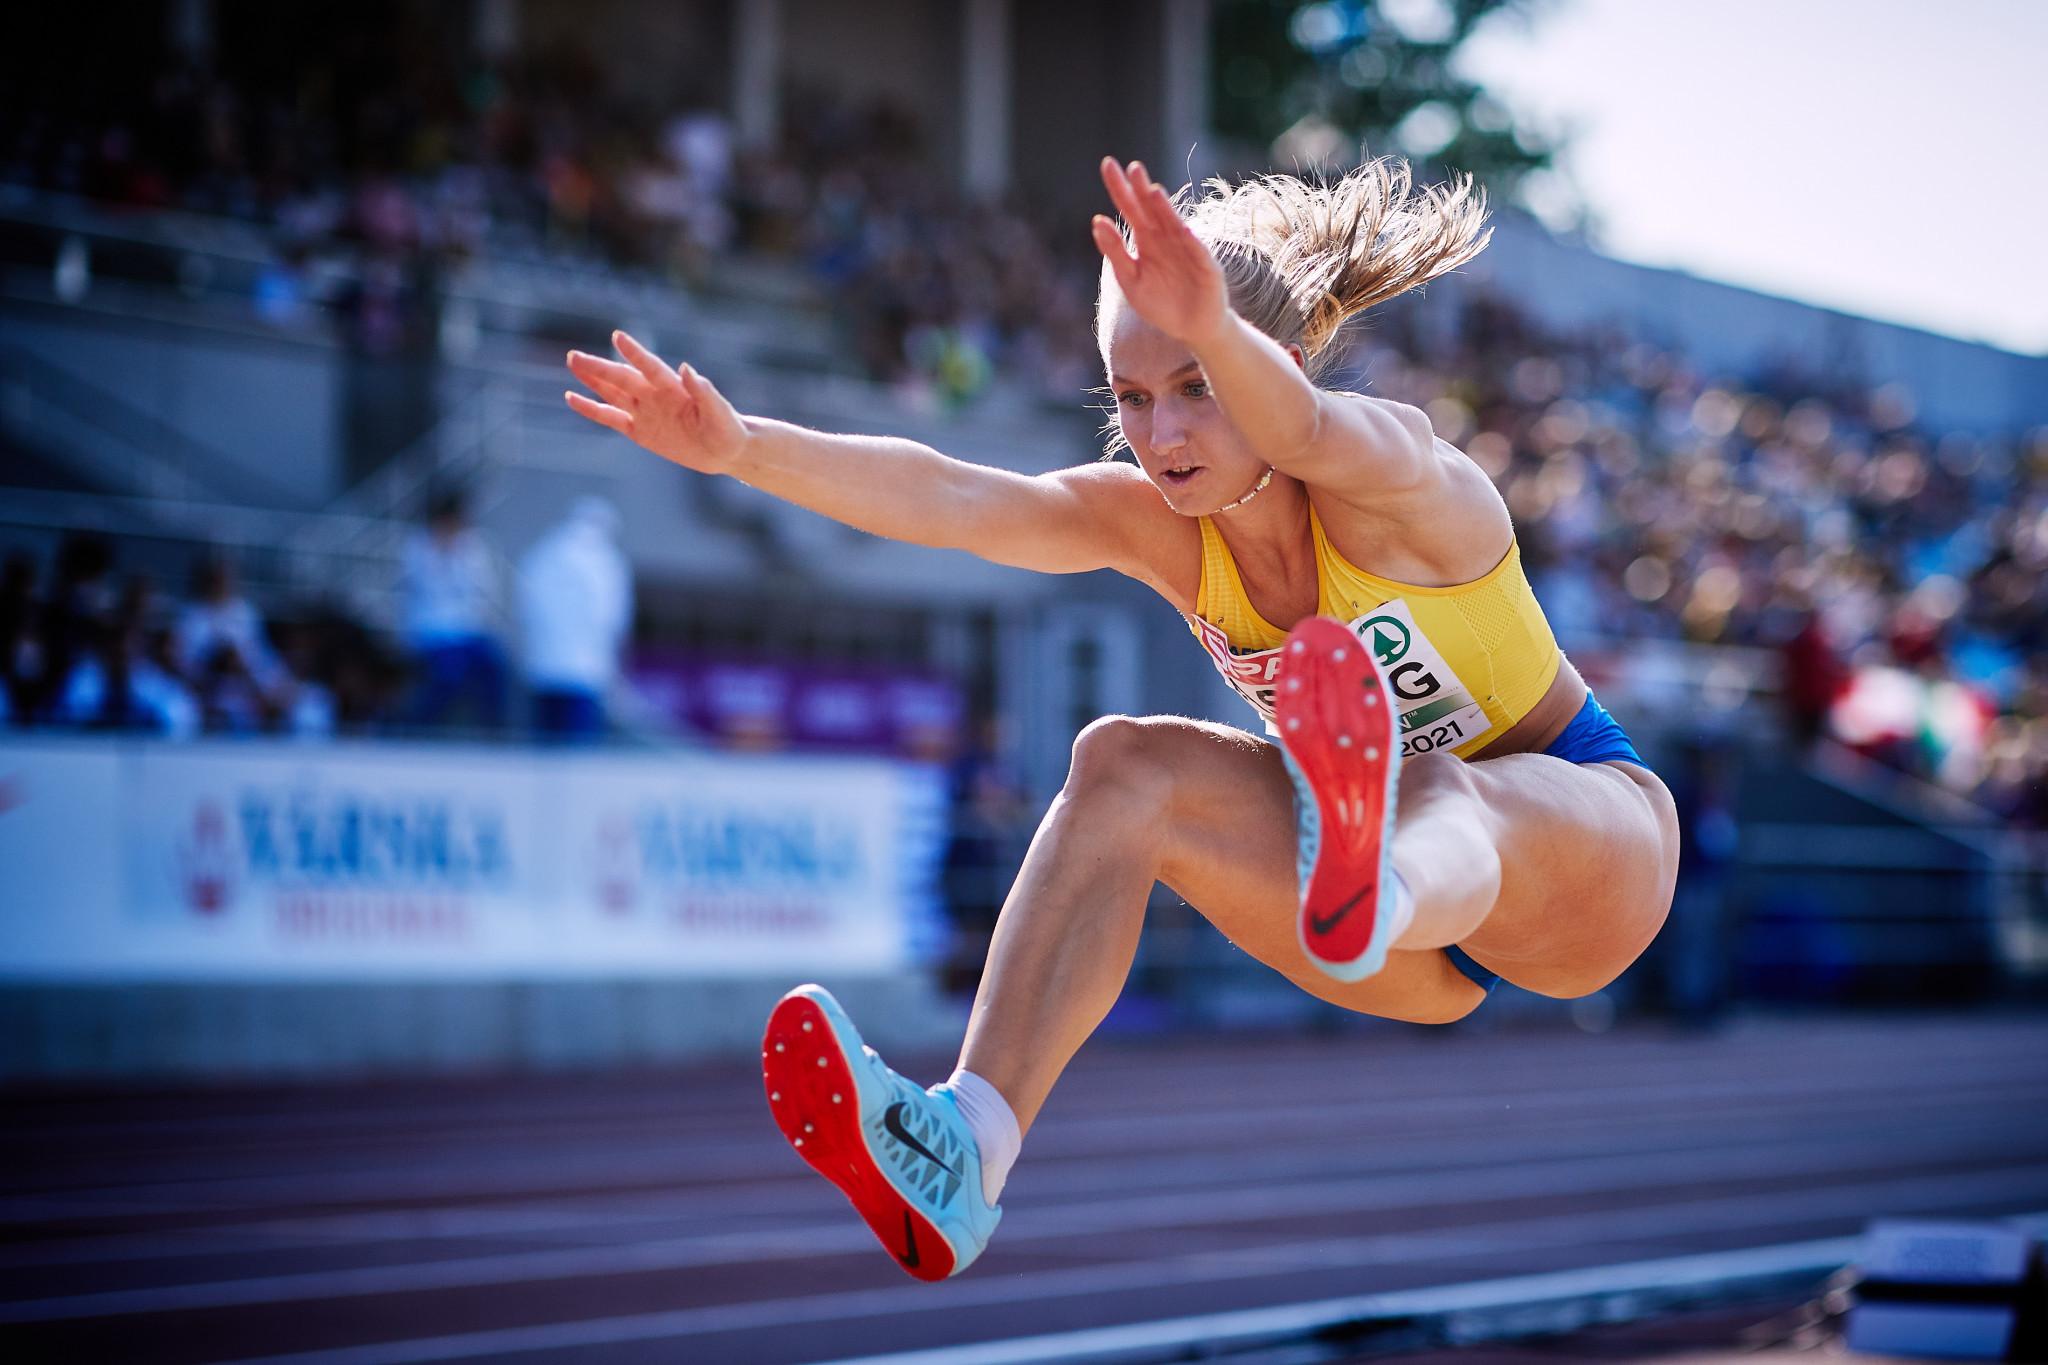 Sweden's Maja Åskag completed the triple jump-long jump double in Nairobi ©Dan Vernon for World Athletics